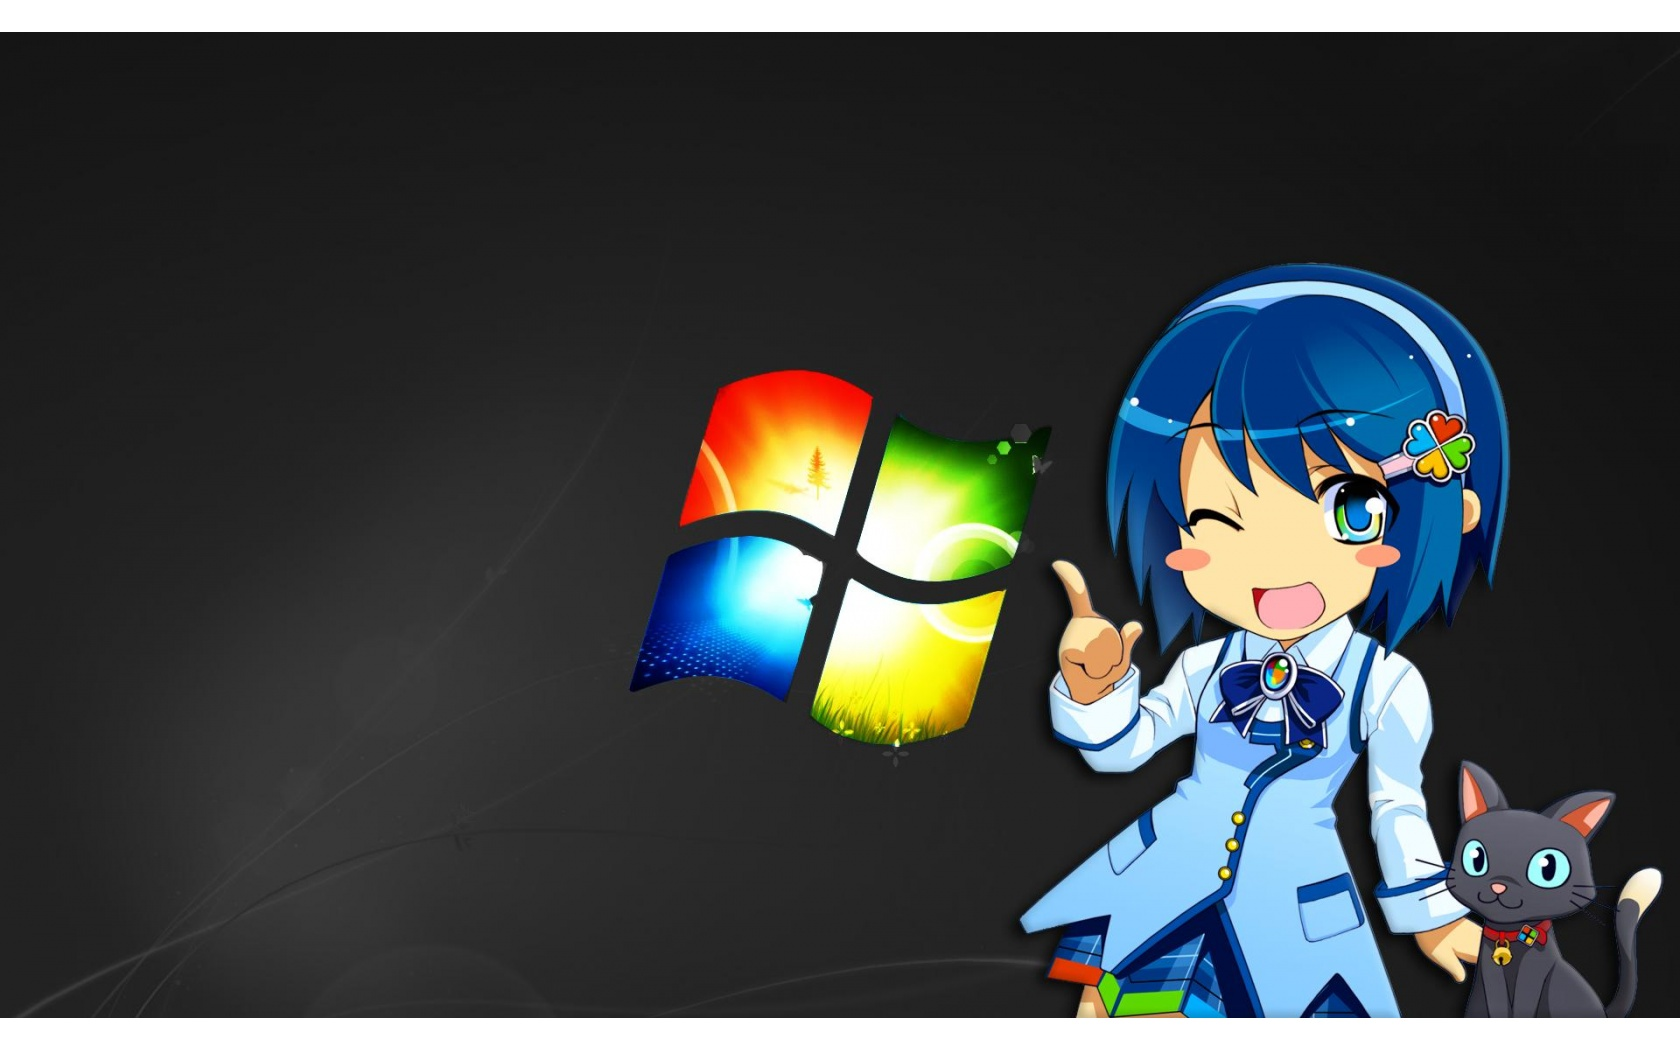 Anime Windows Girl 1680 x 1050 Download Close 1680x1050